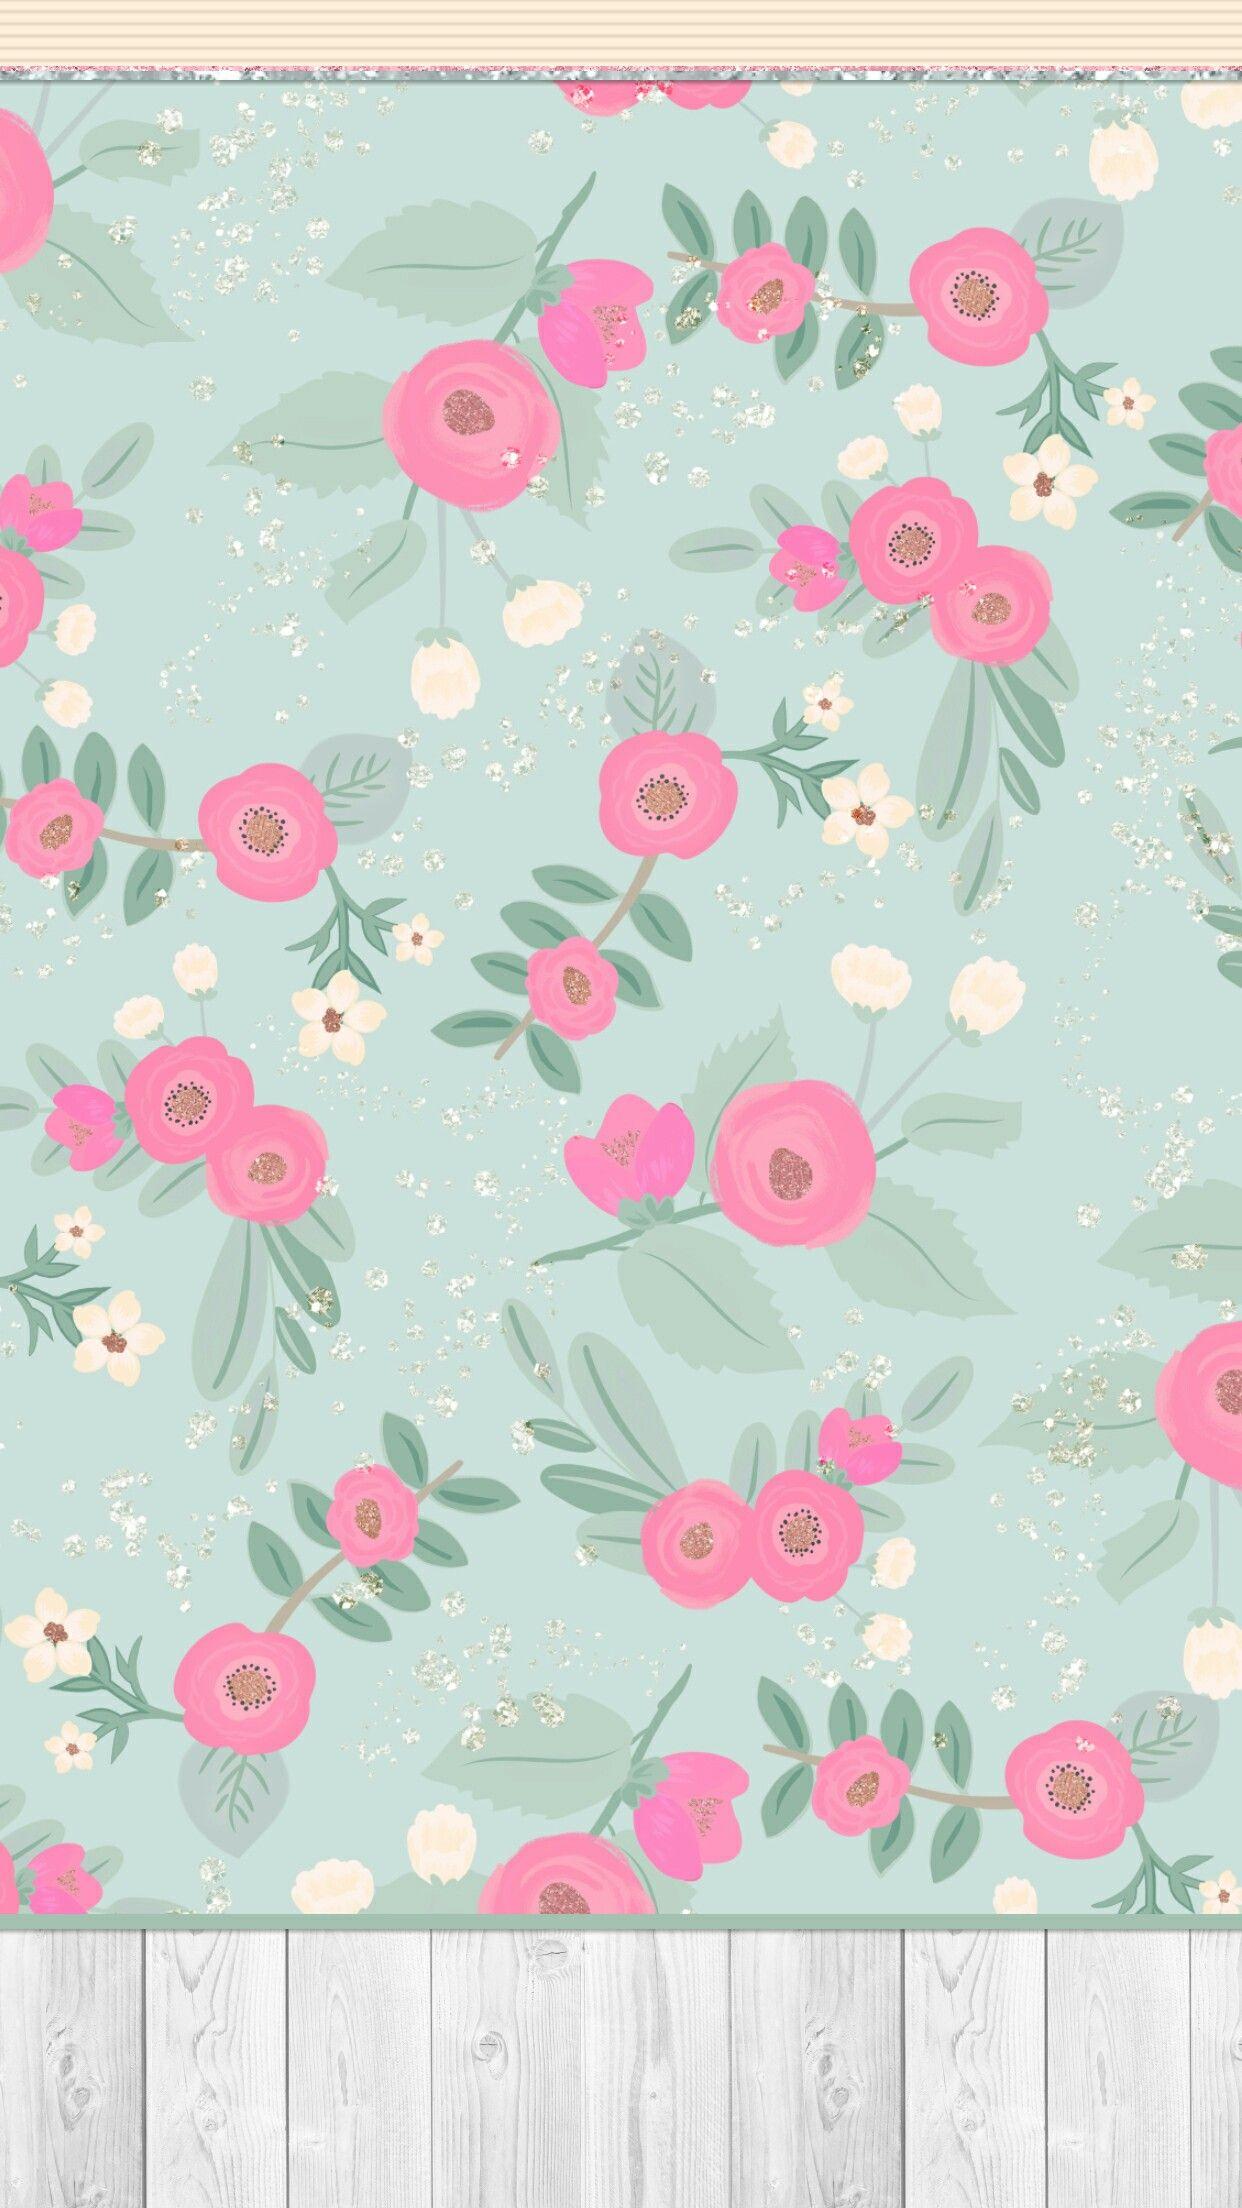 Beautiful Wallpaper Hello Kitty Wall - f8091e1a8e0c155363e5e1a6b3596859  Best Photo Reference_365417.jpg